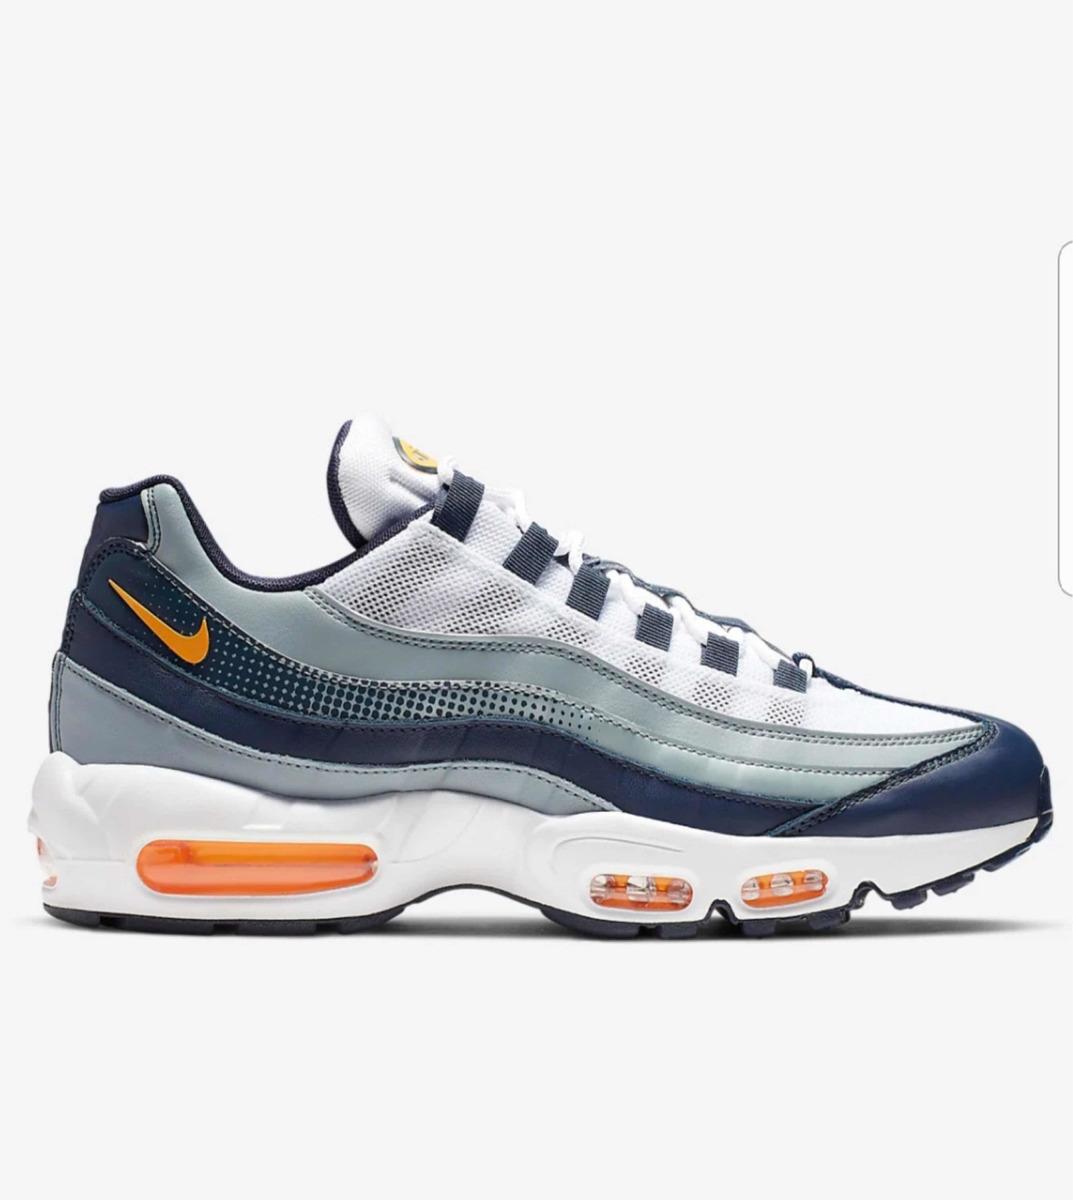 2nike hombre zapatillas 2019 air max